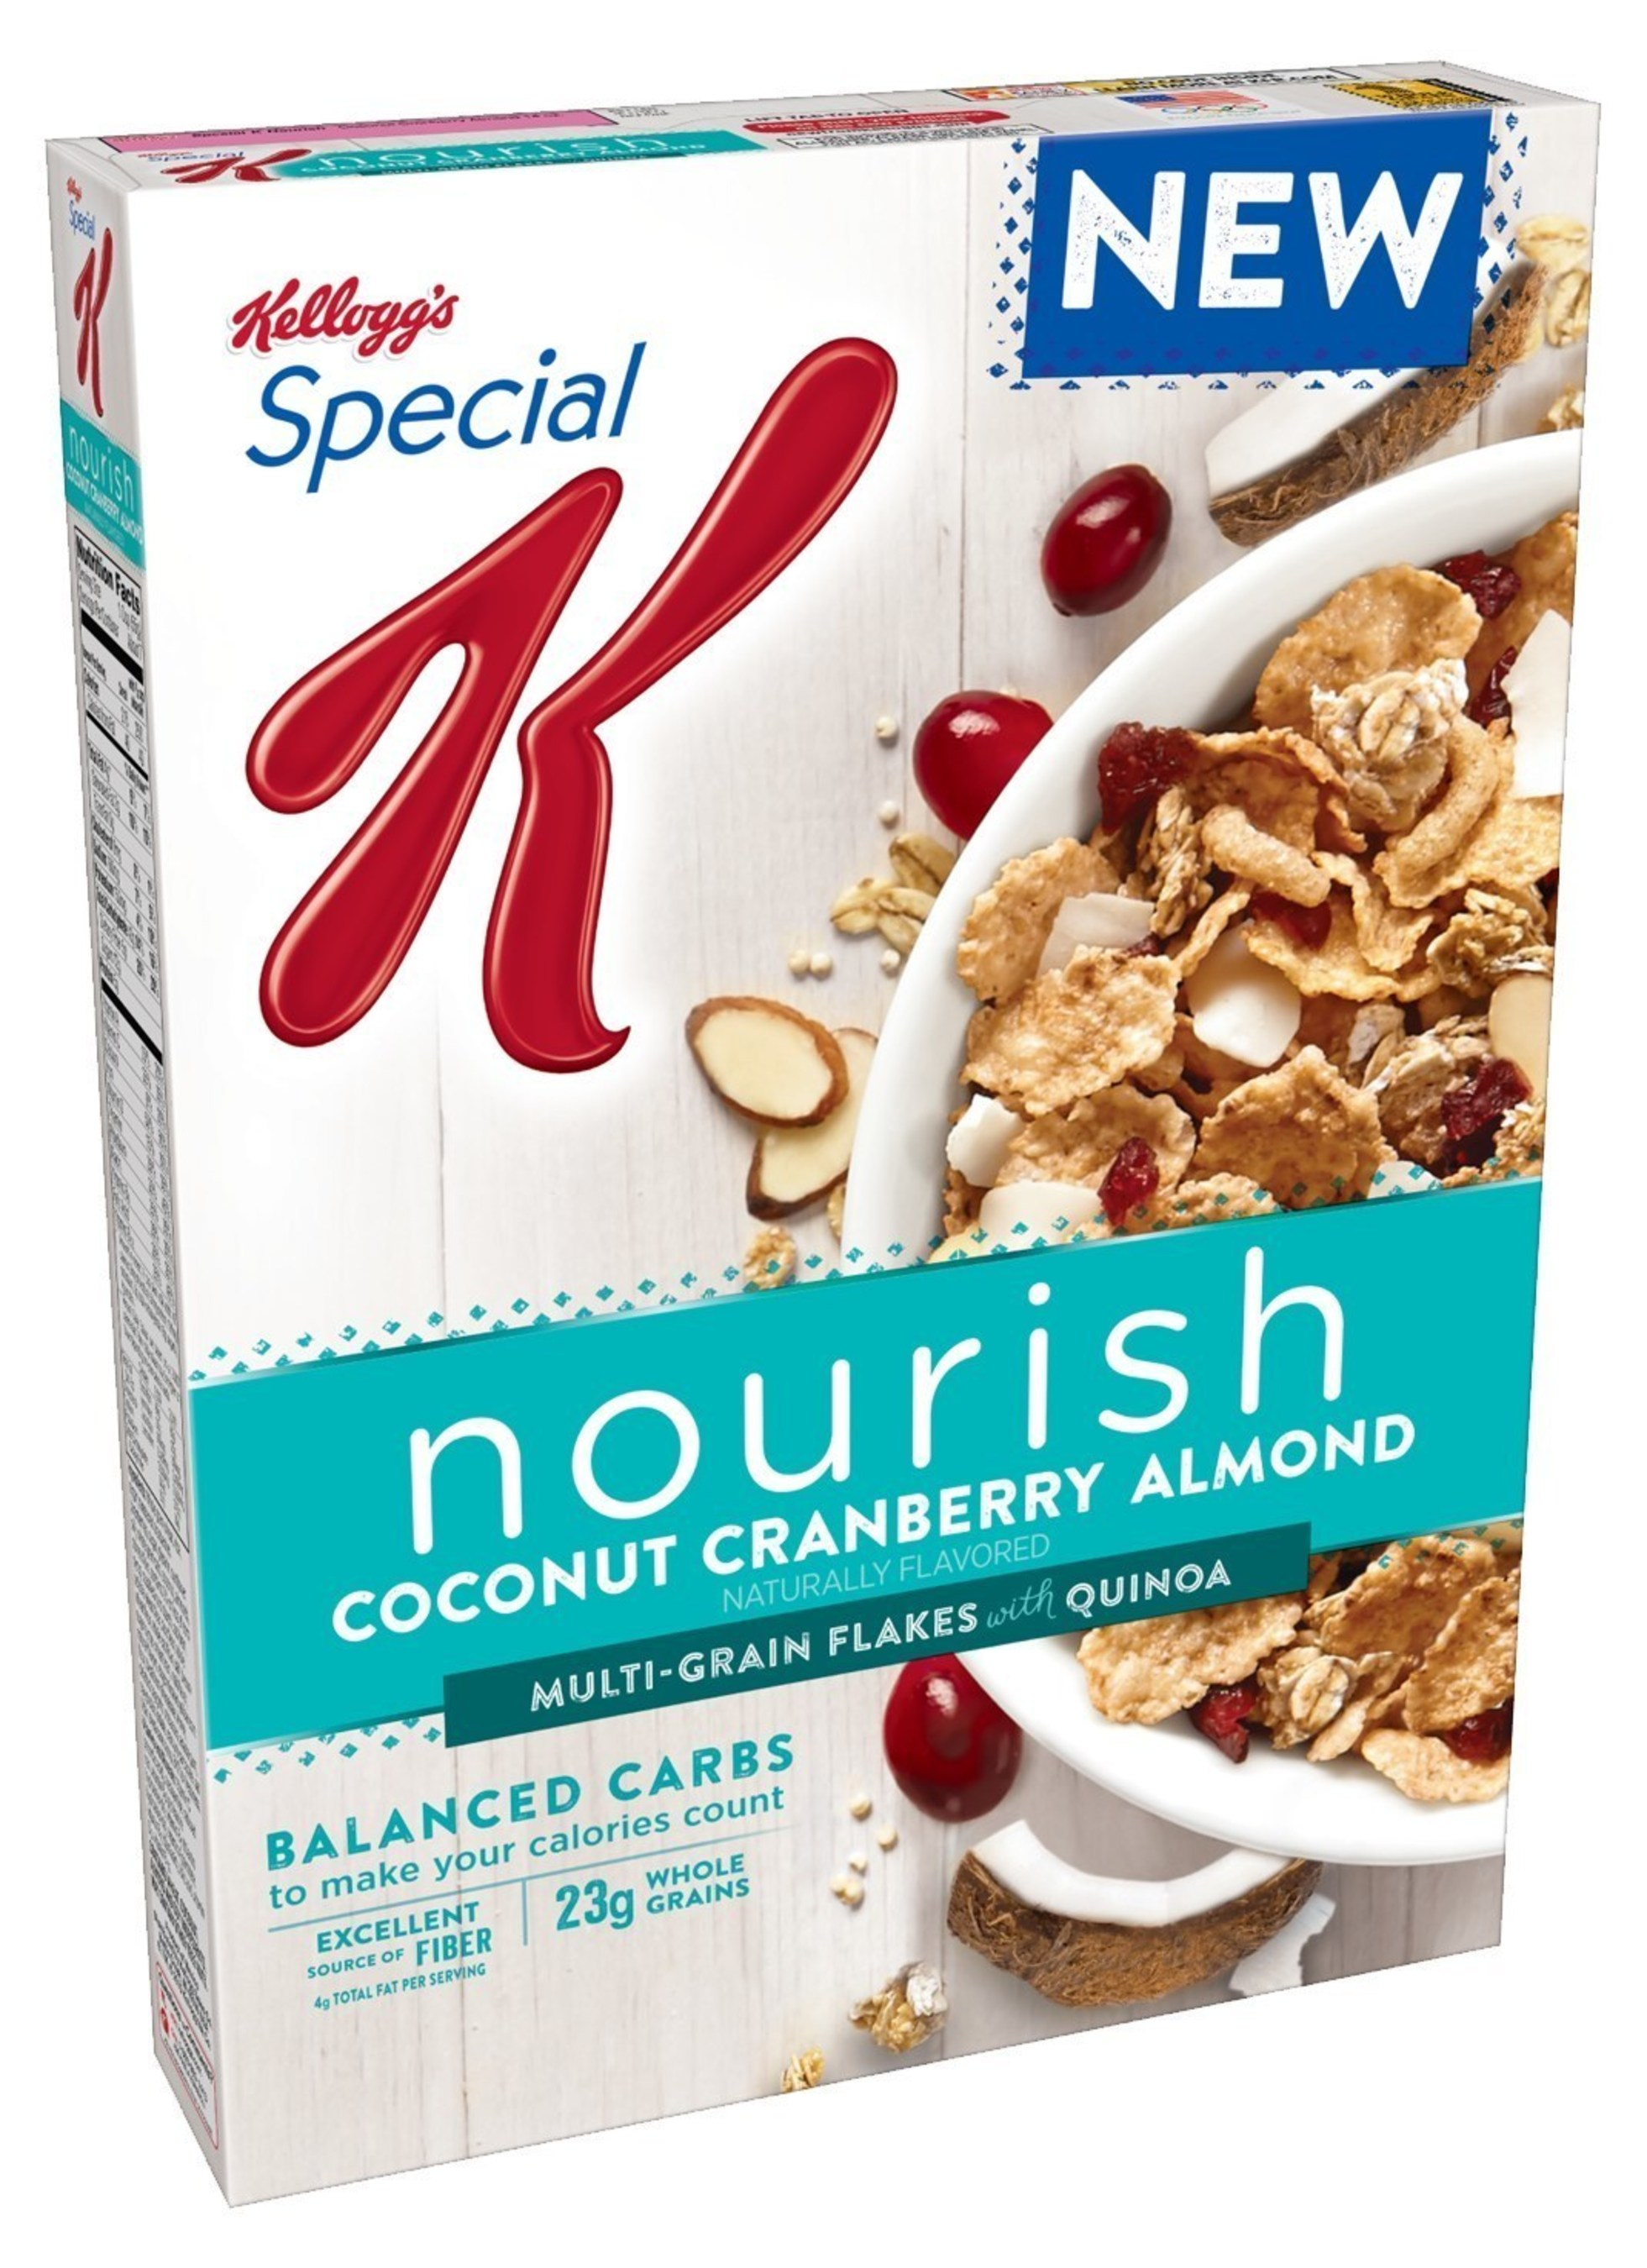 Kellogg's(R) Special K(R) Nourish Coconut Cranberry Almond cereal